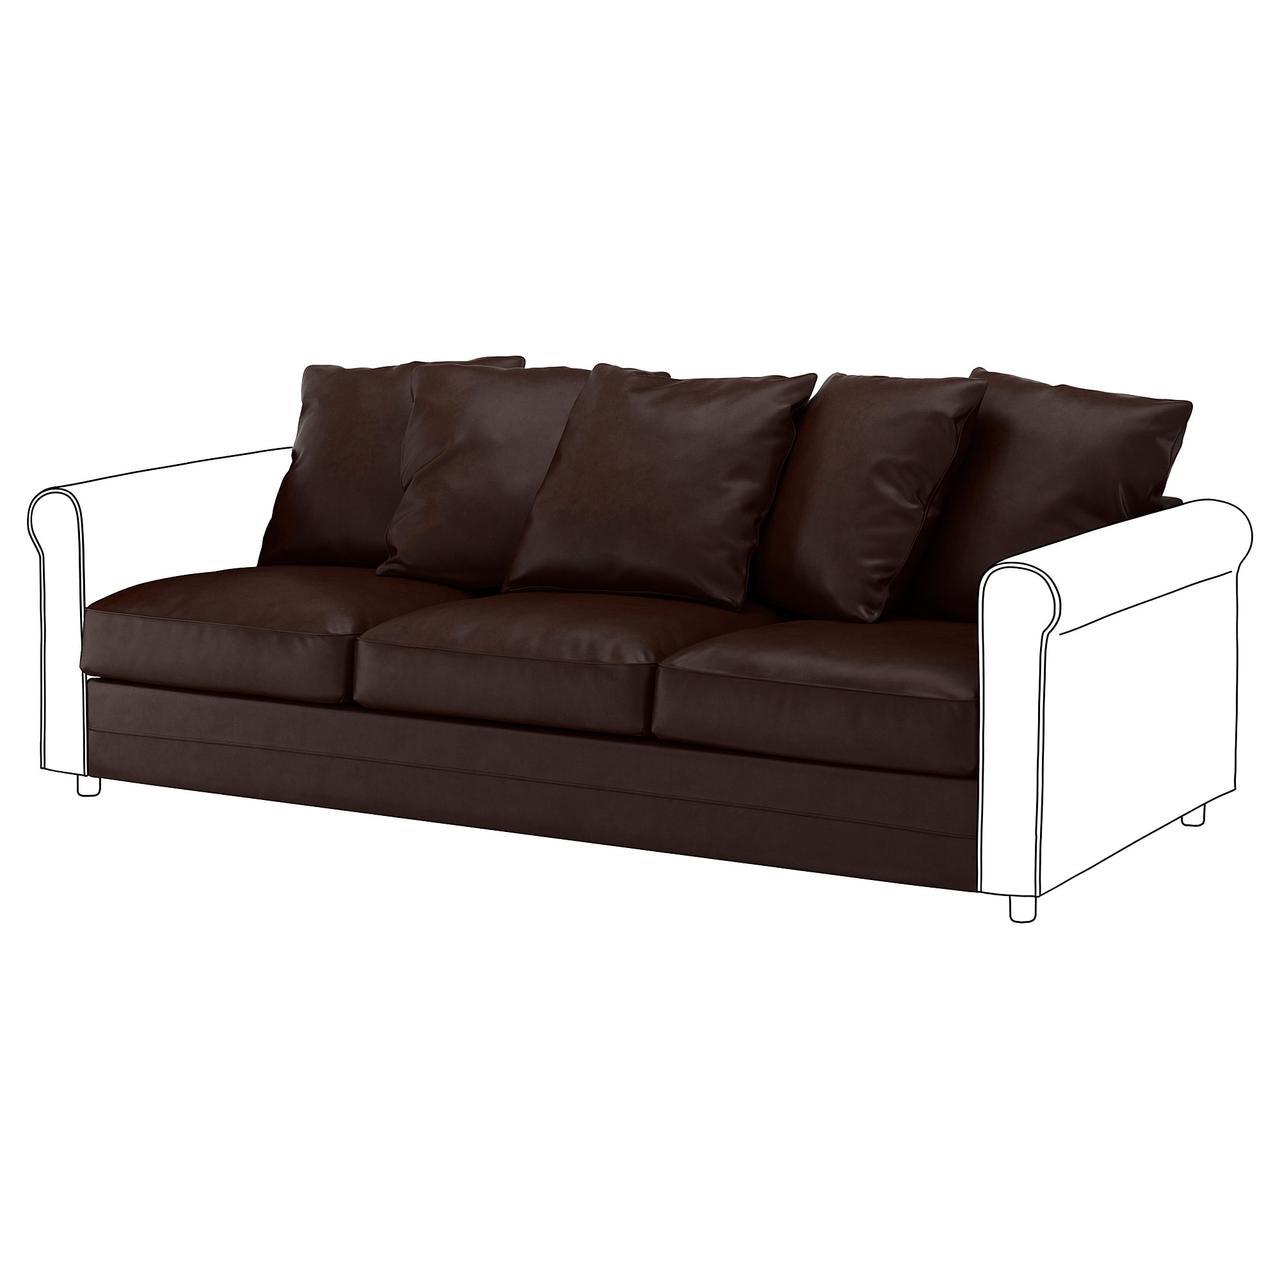 IKEA Модульная секция дивана GRÖNLID (303.976.69)